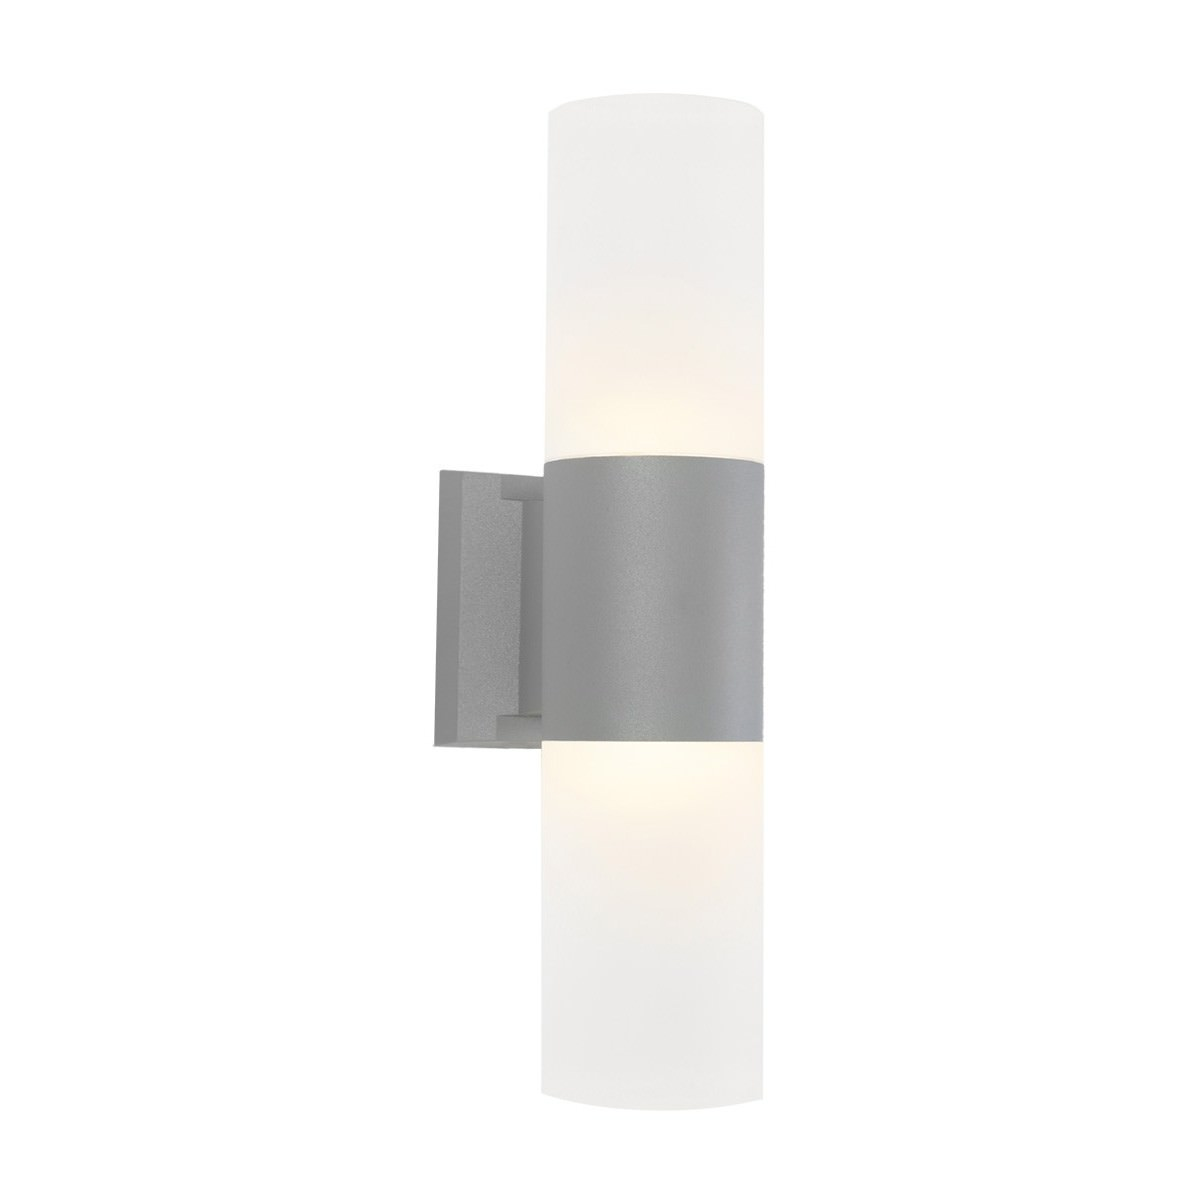 Ottawa IP54 Exterior LED Wall Light, Silver